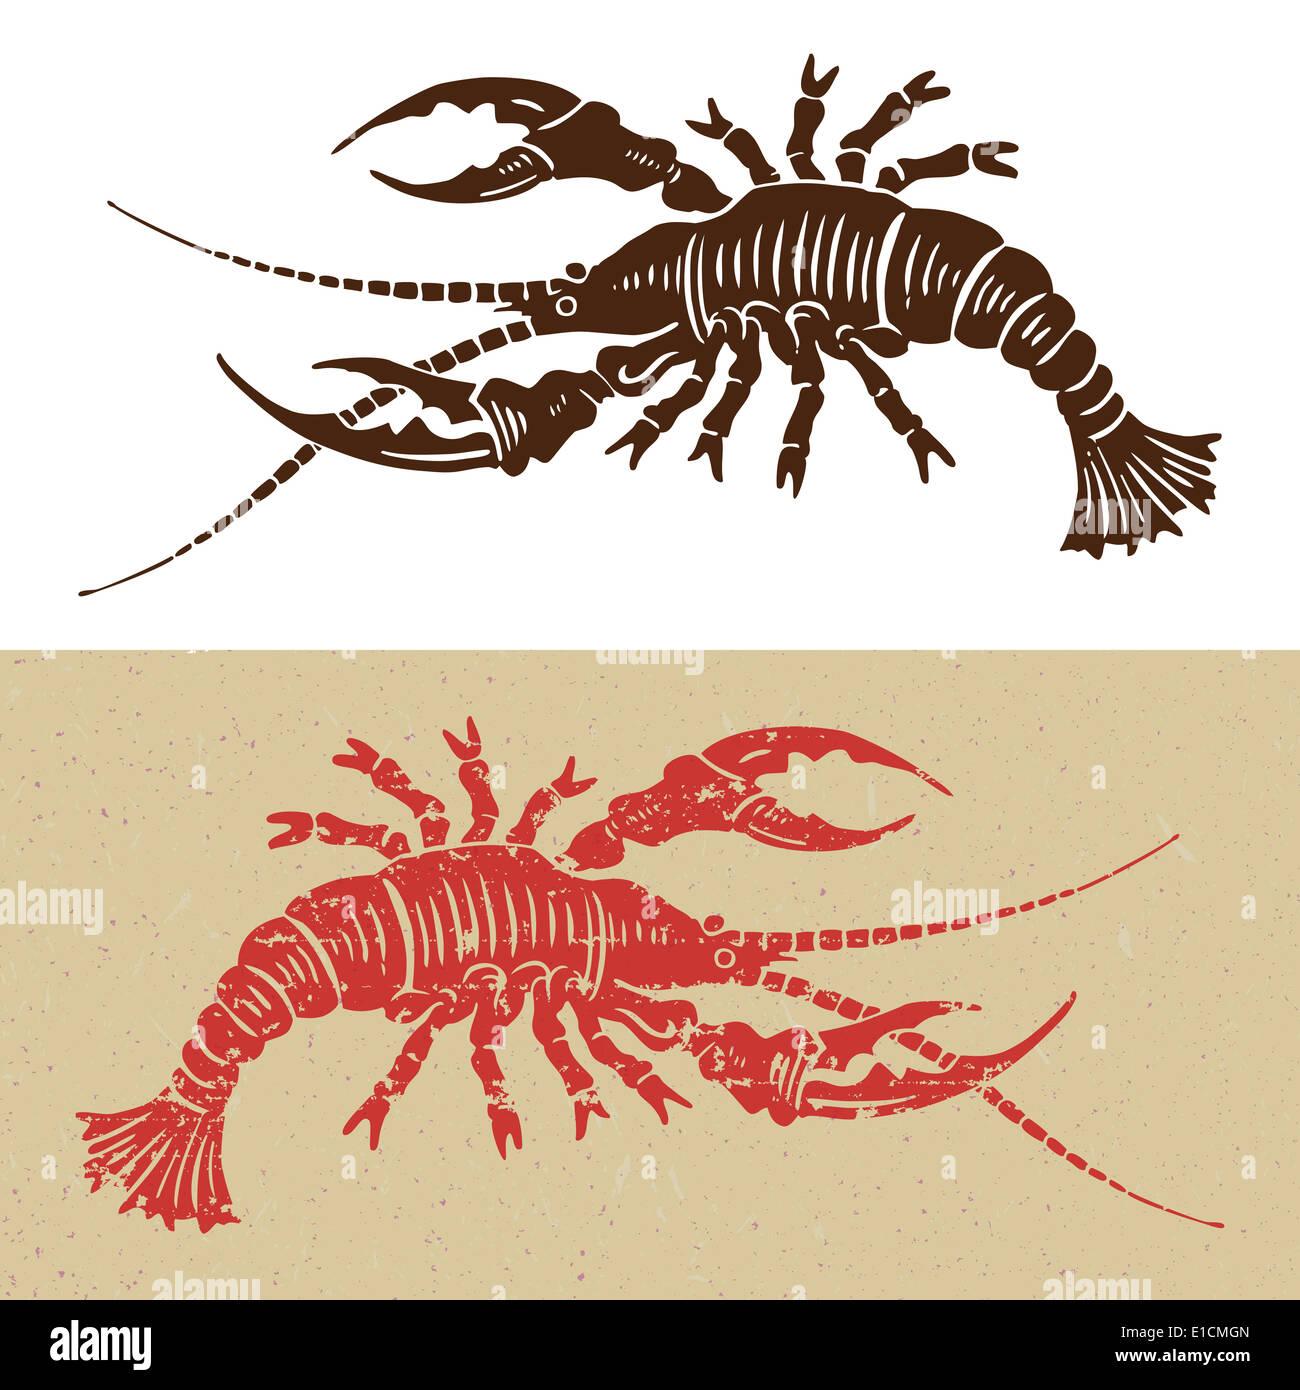 woodcut seafood icon - Stock Image